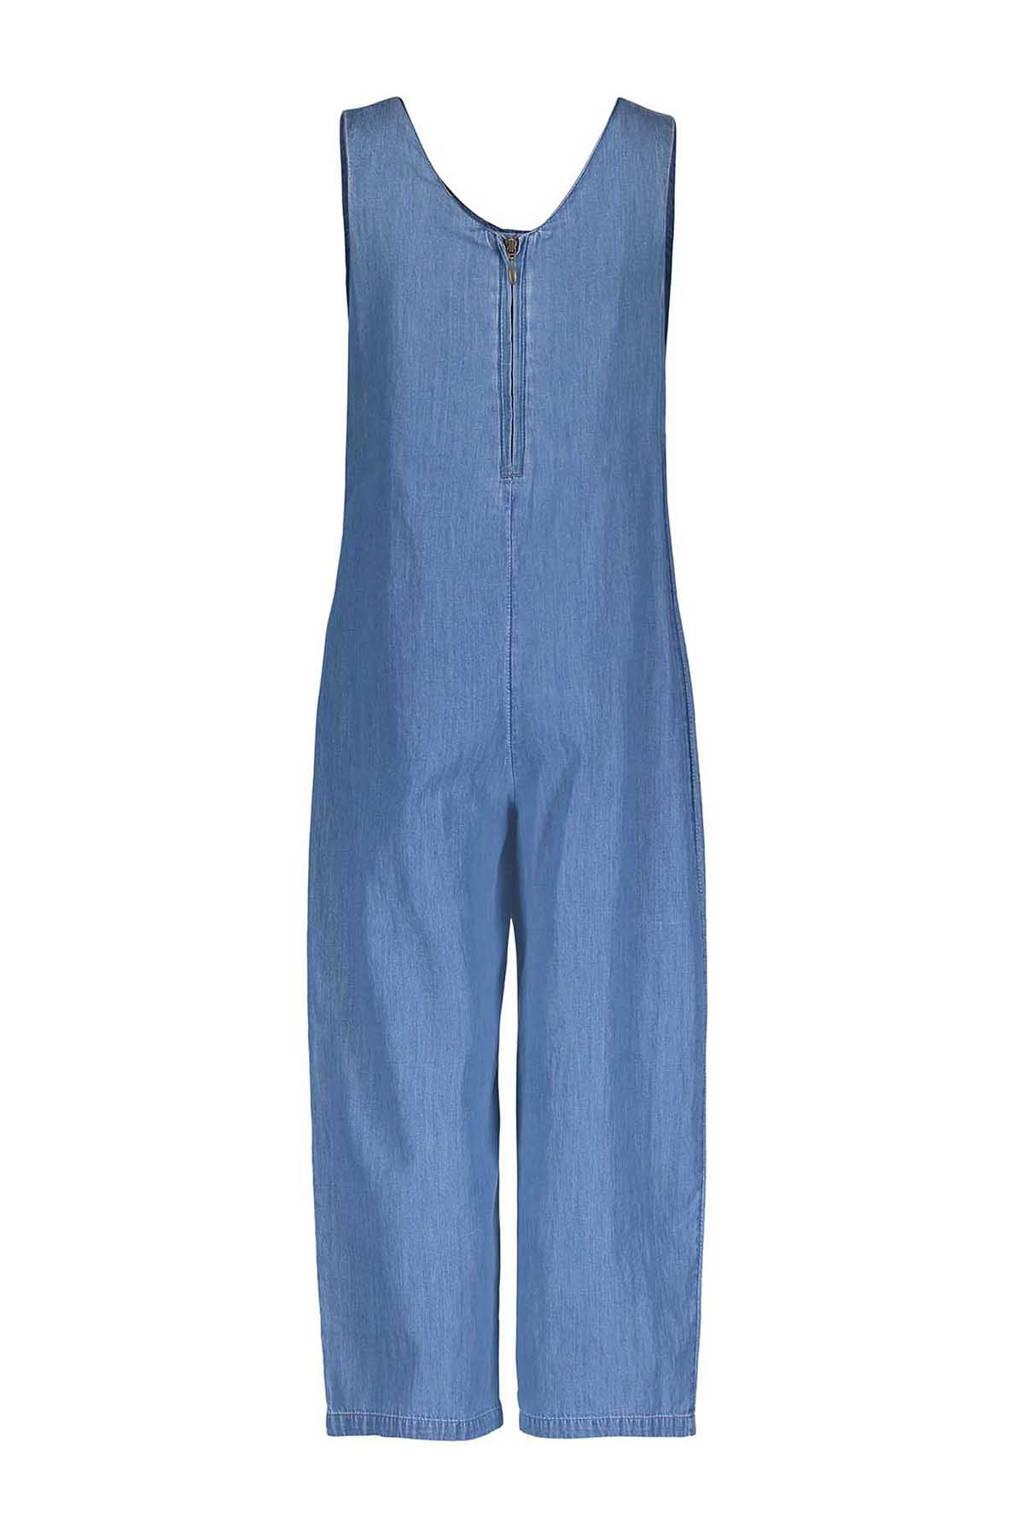 Ongekend Sissy-Boy spijker jumpsuit | wehkamp TV-01